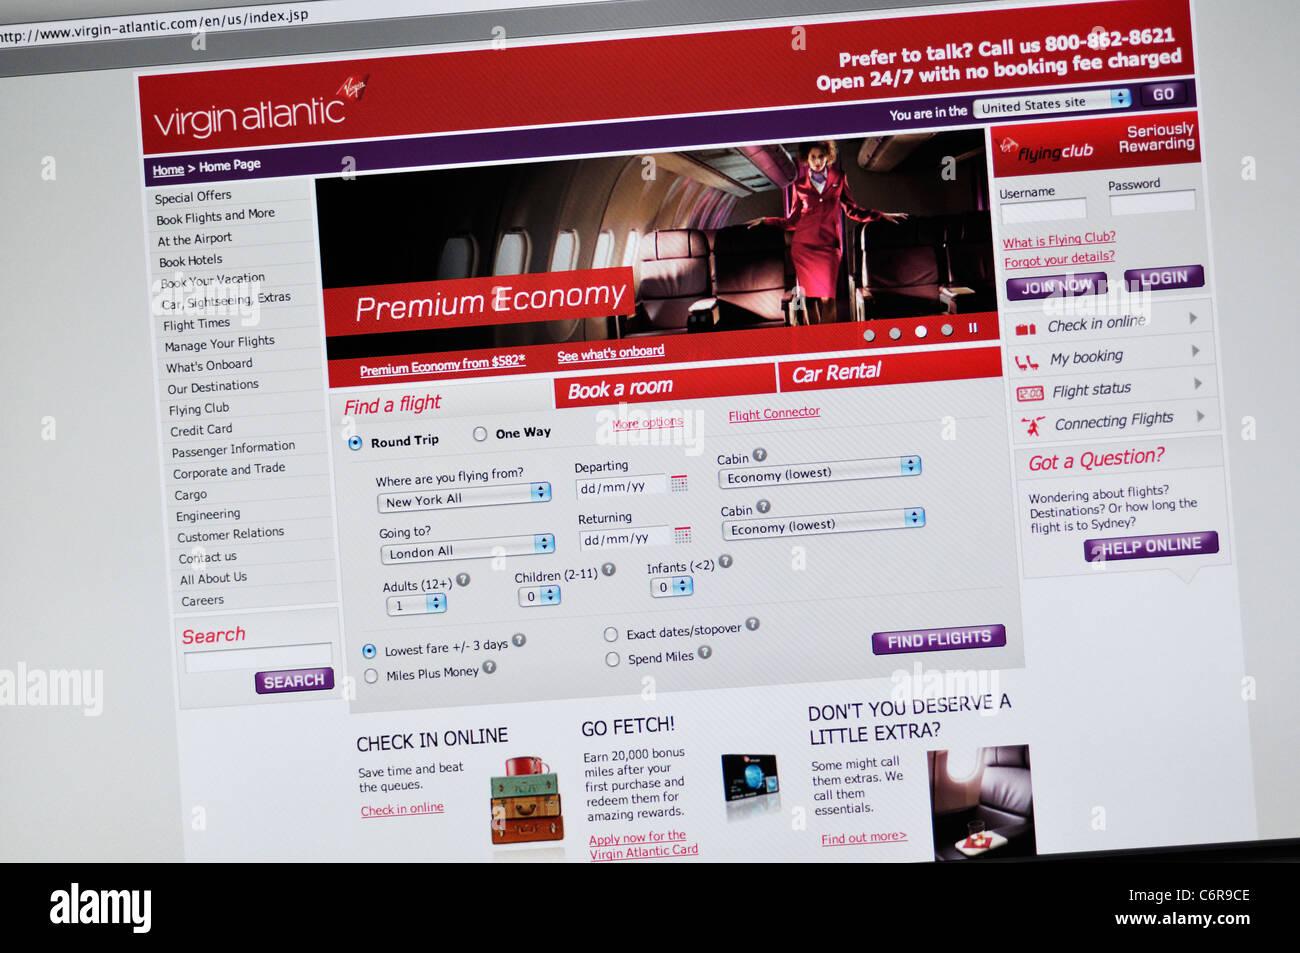 Virgin Atlantic airlines website Stock Photo: 38620974 - Alamy